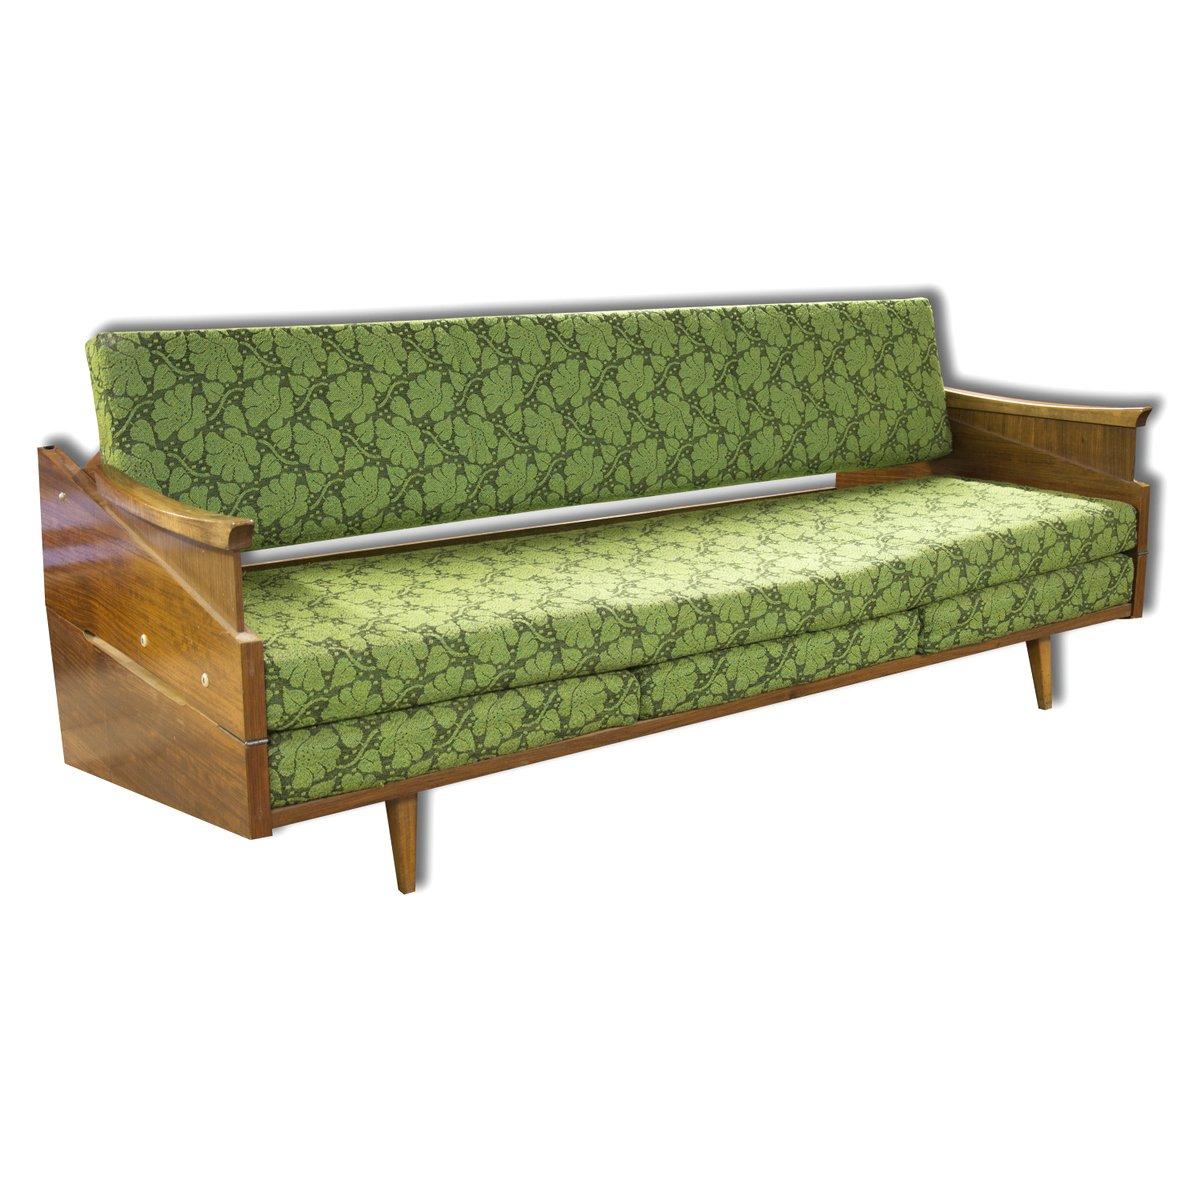 Vintage Czech Sofa Bed 1960s 6 Price 923 00 Regular 1 163